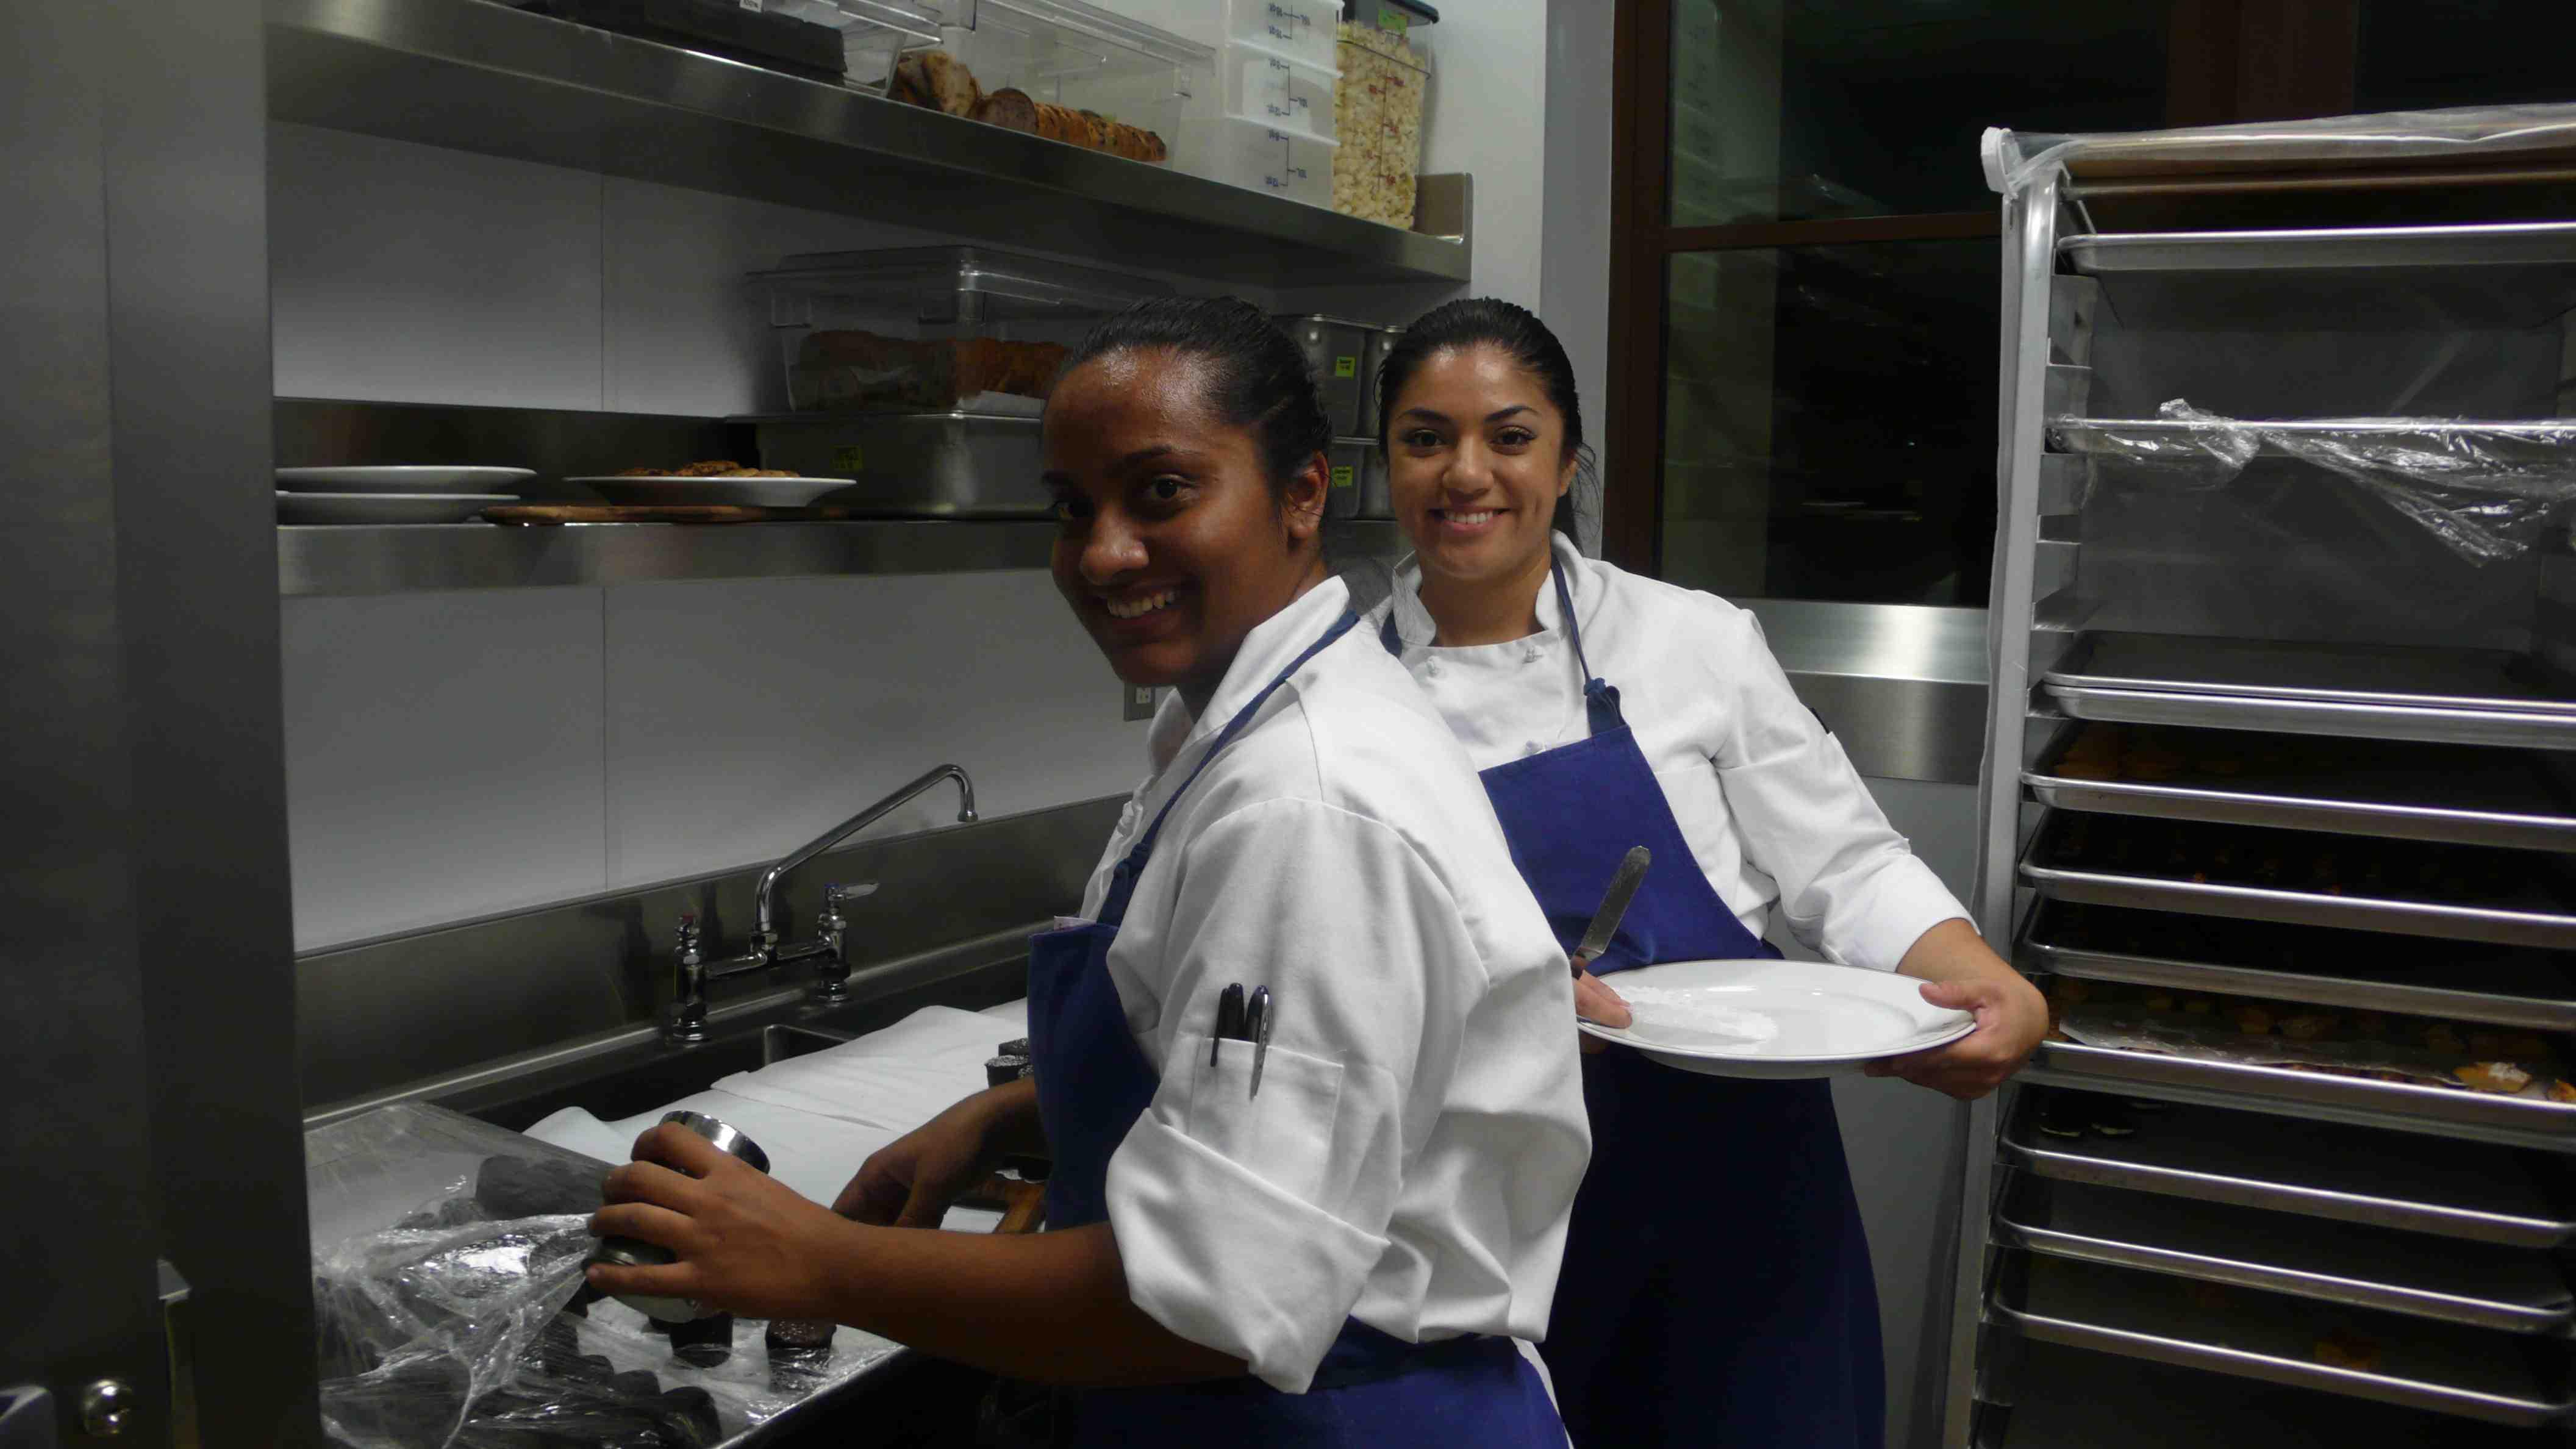 Chefs plating desserts